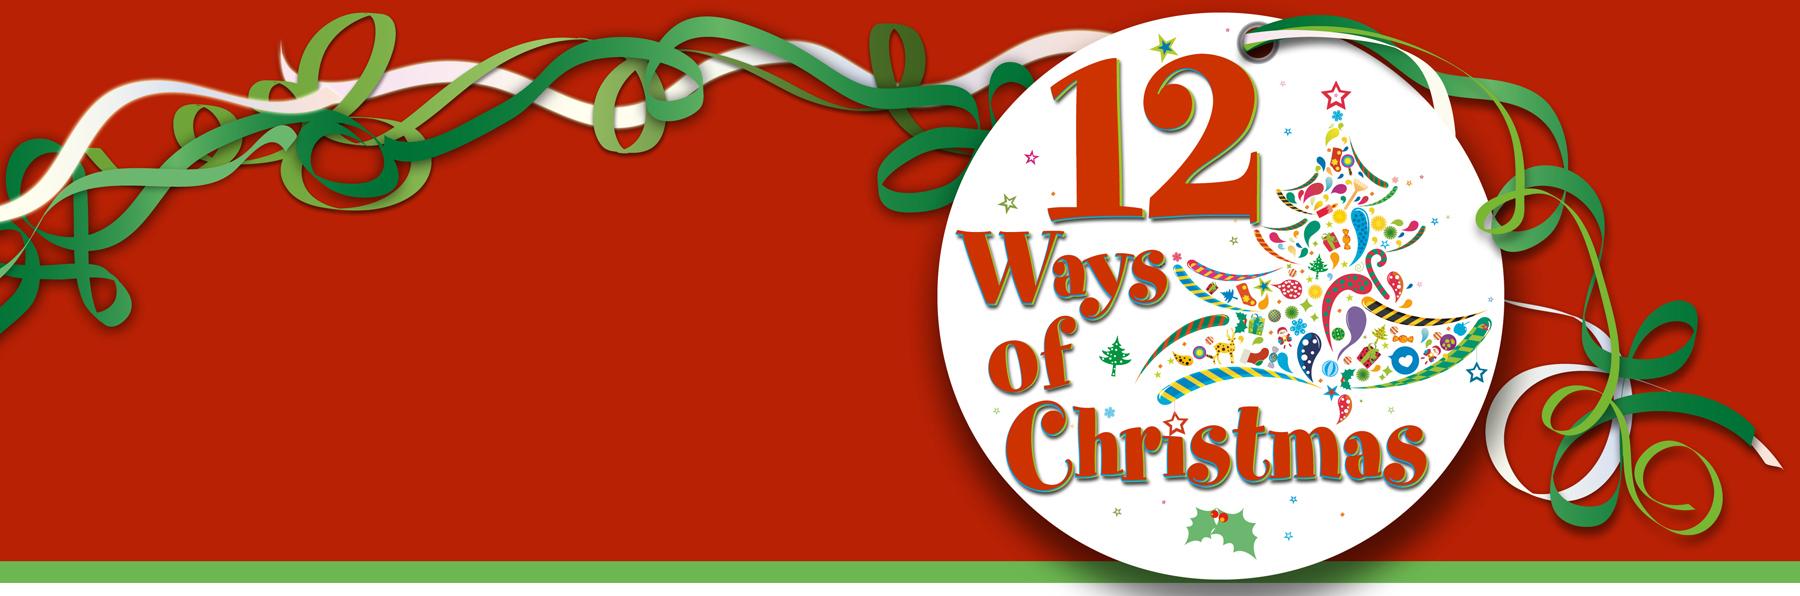 12 Ways of Christmas: Easy, peasy holiday ideas!